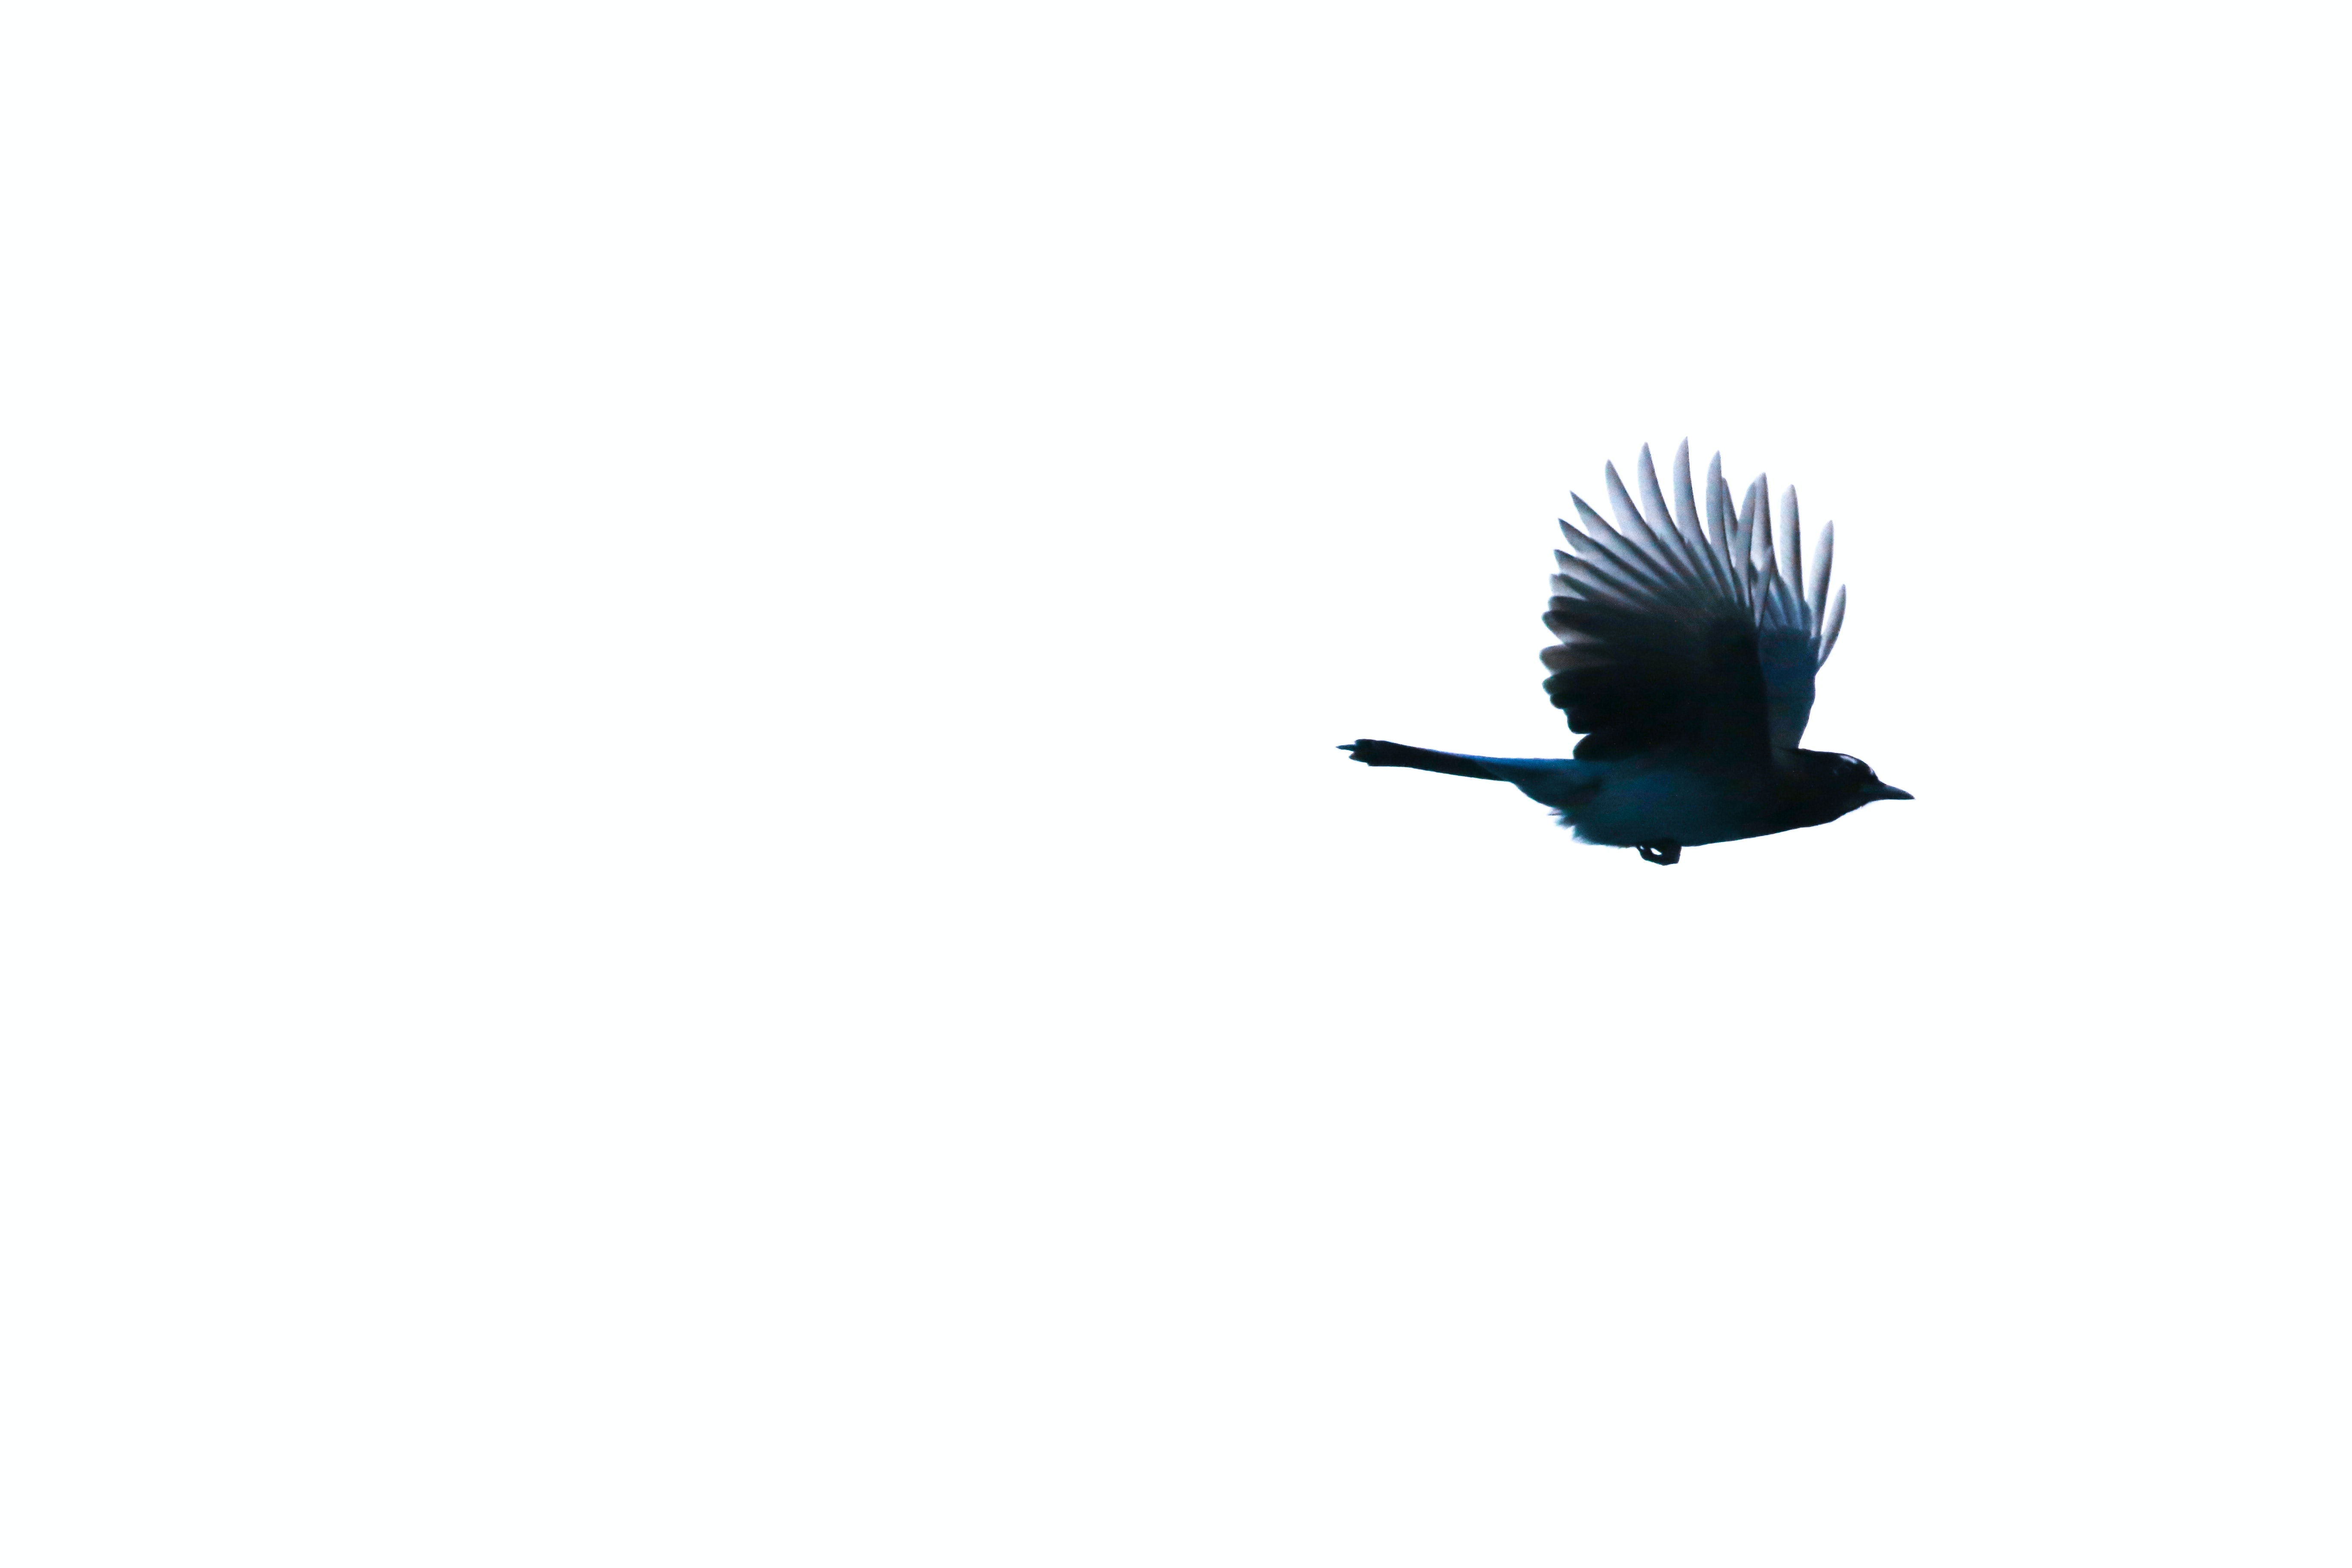 close-up photo of blue bird